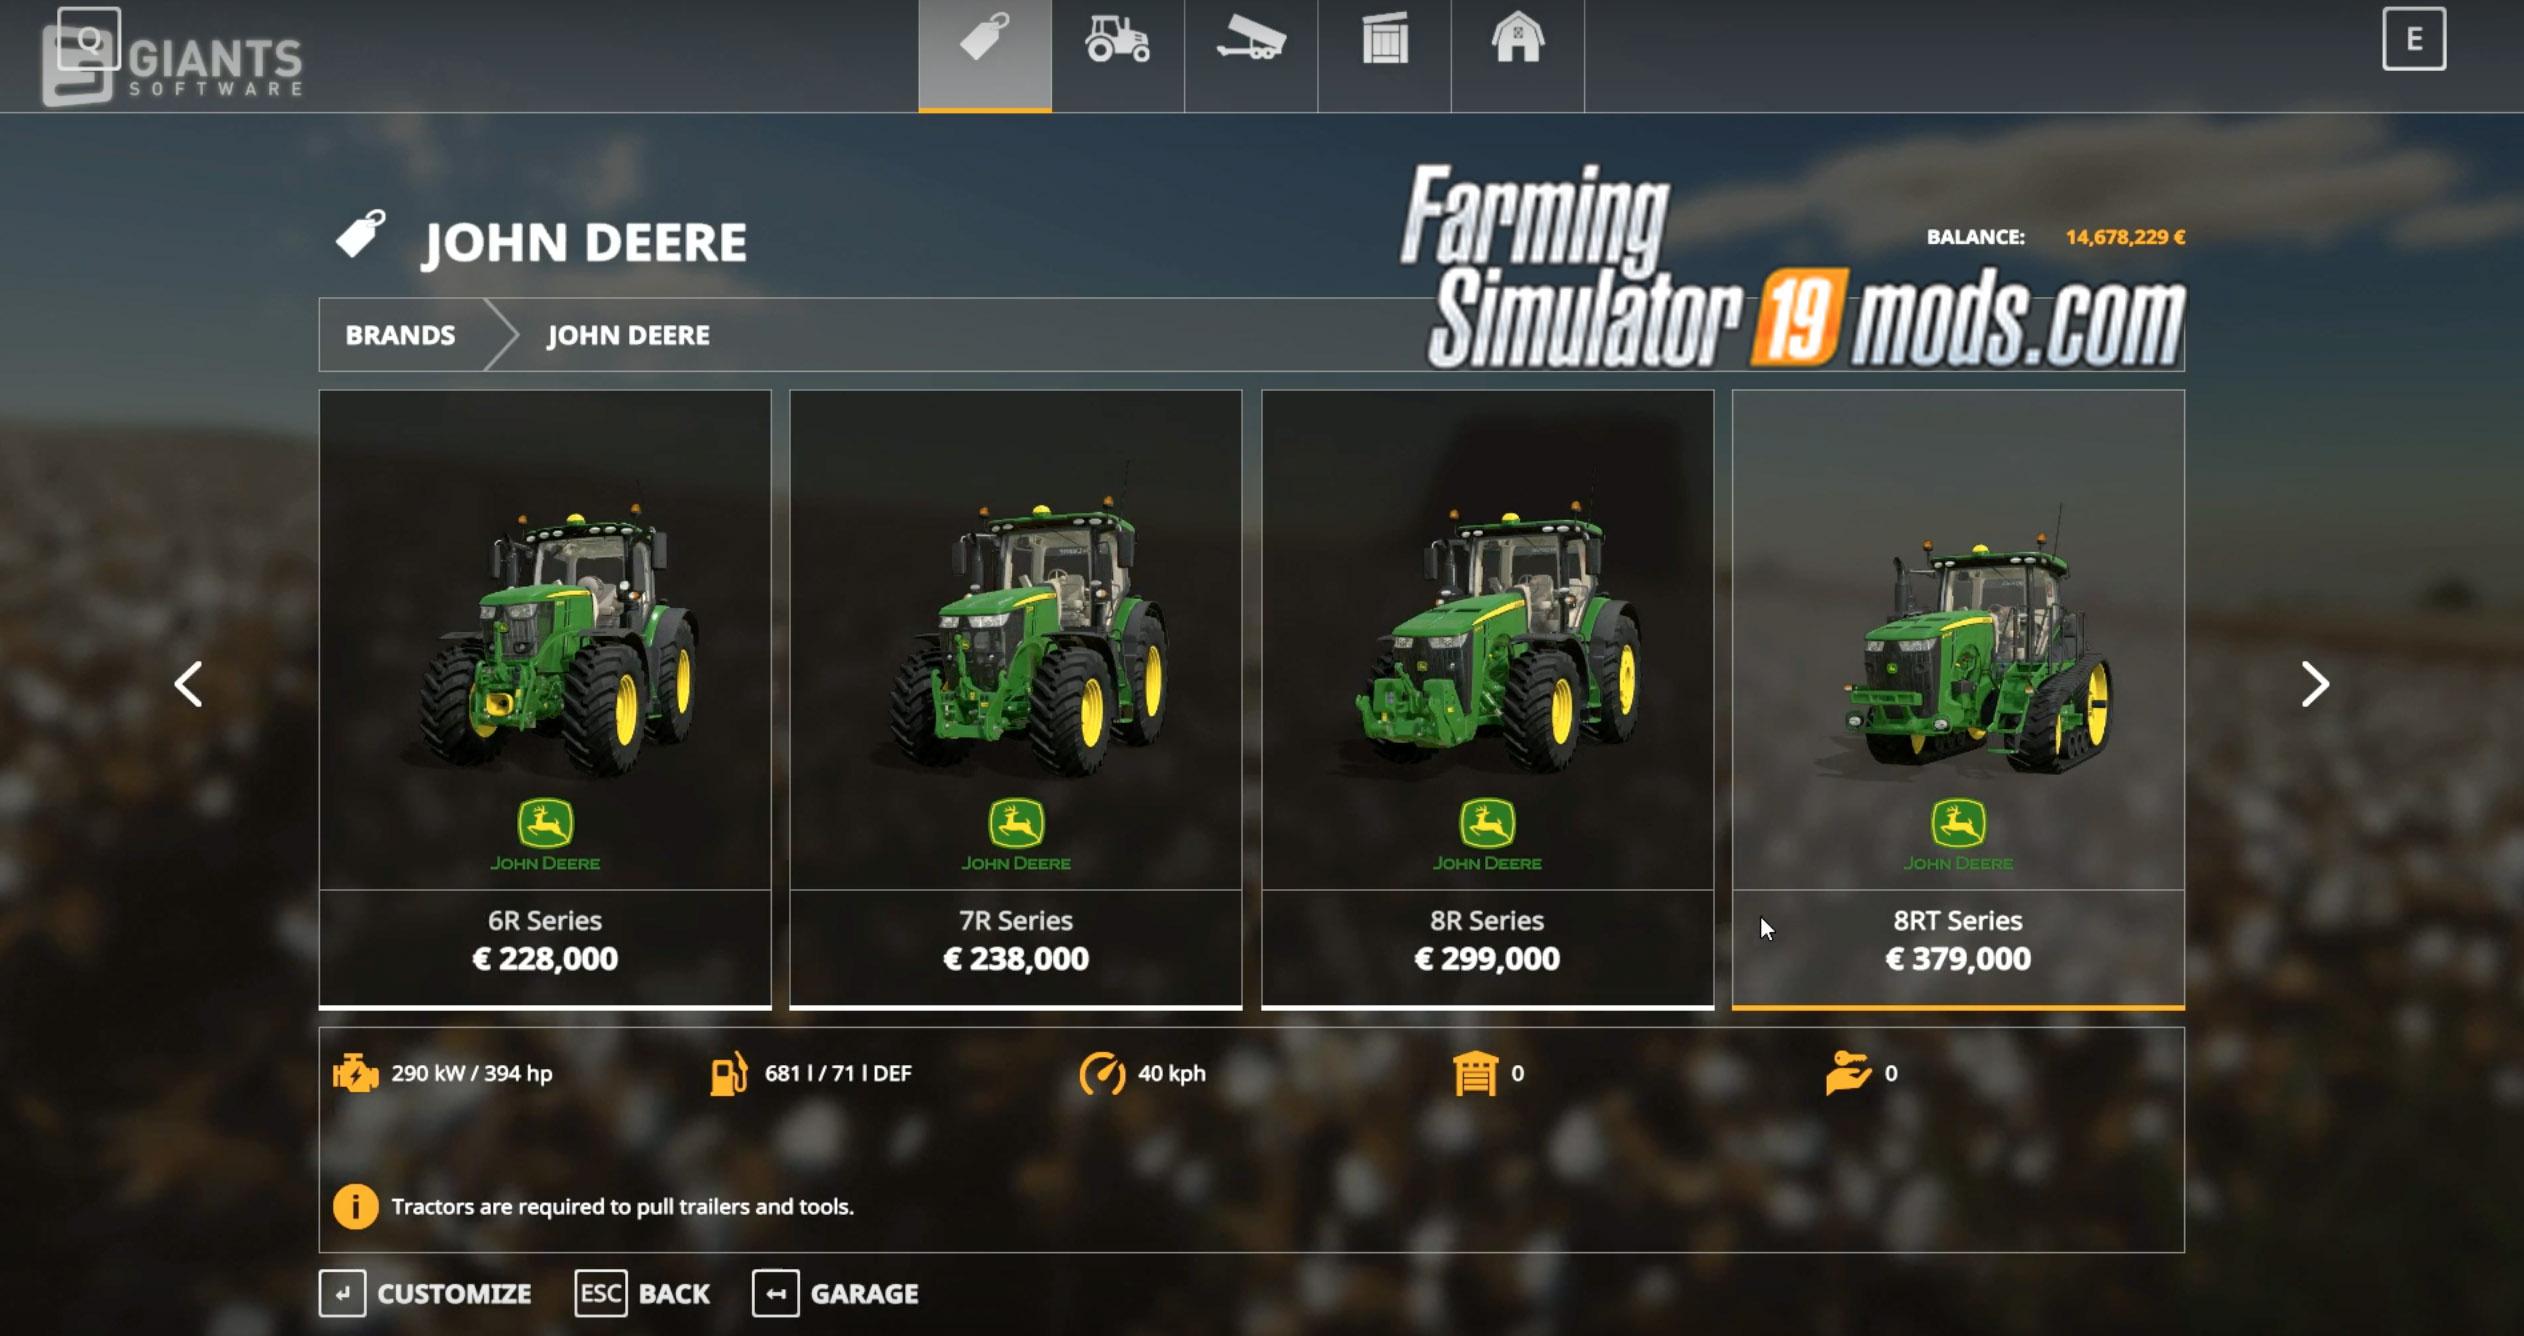 John Deere Tractors, Combines & Tools in Farming Simulator